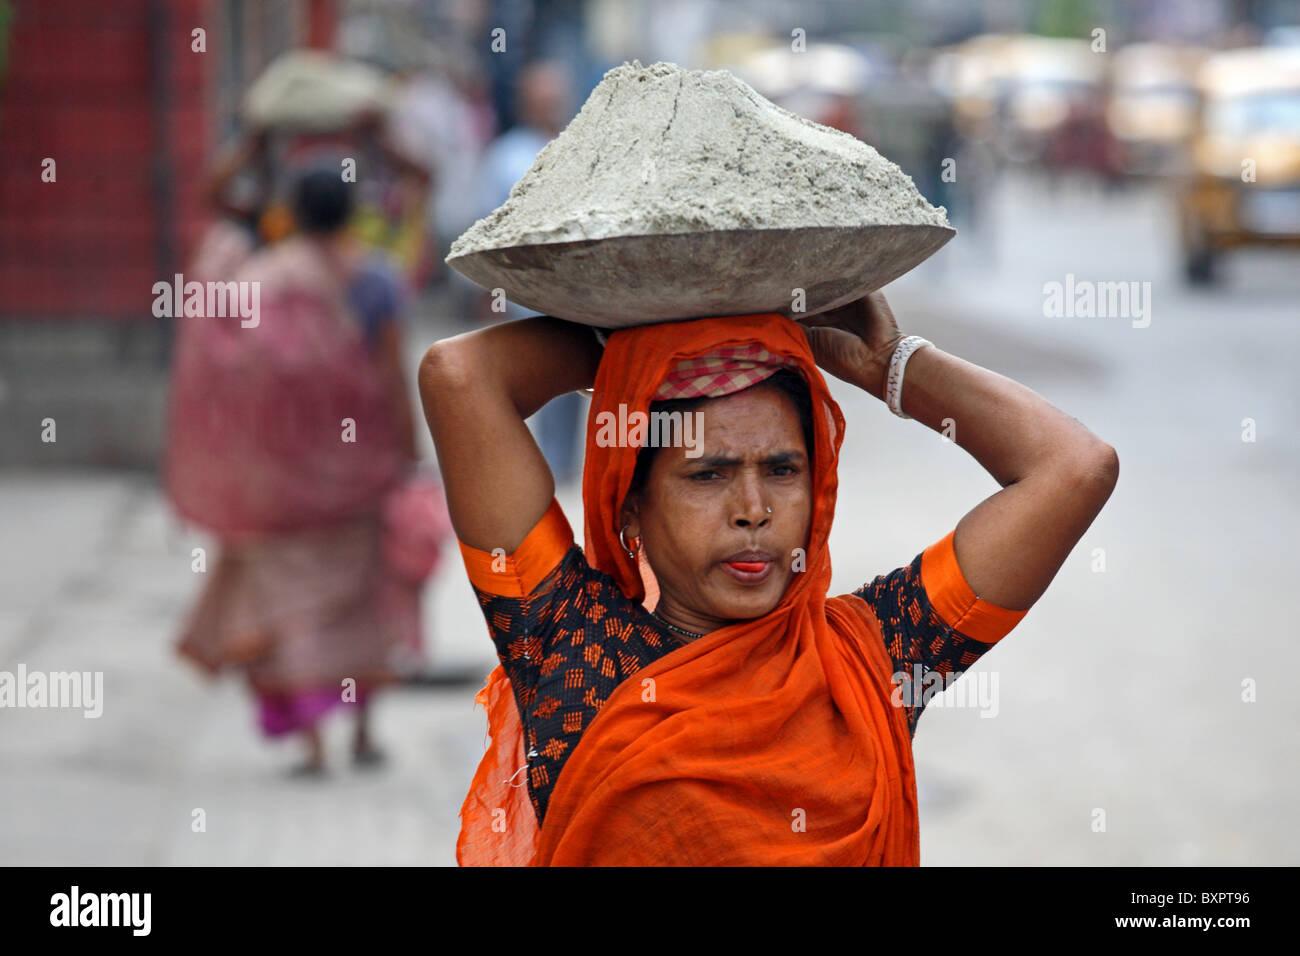 Female manual labourer on street in Calcutta, India - Stock Image